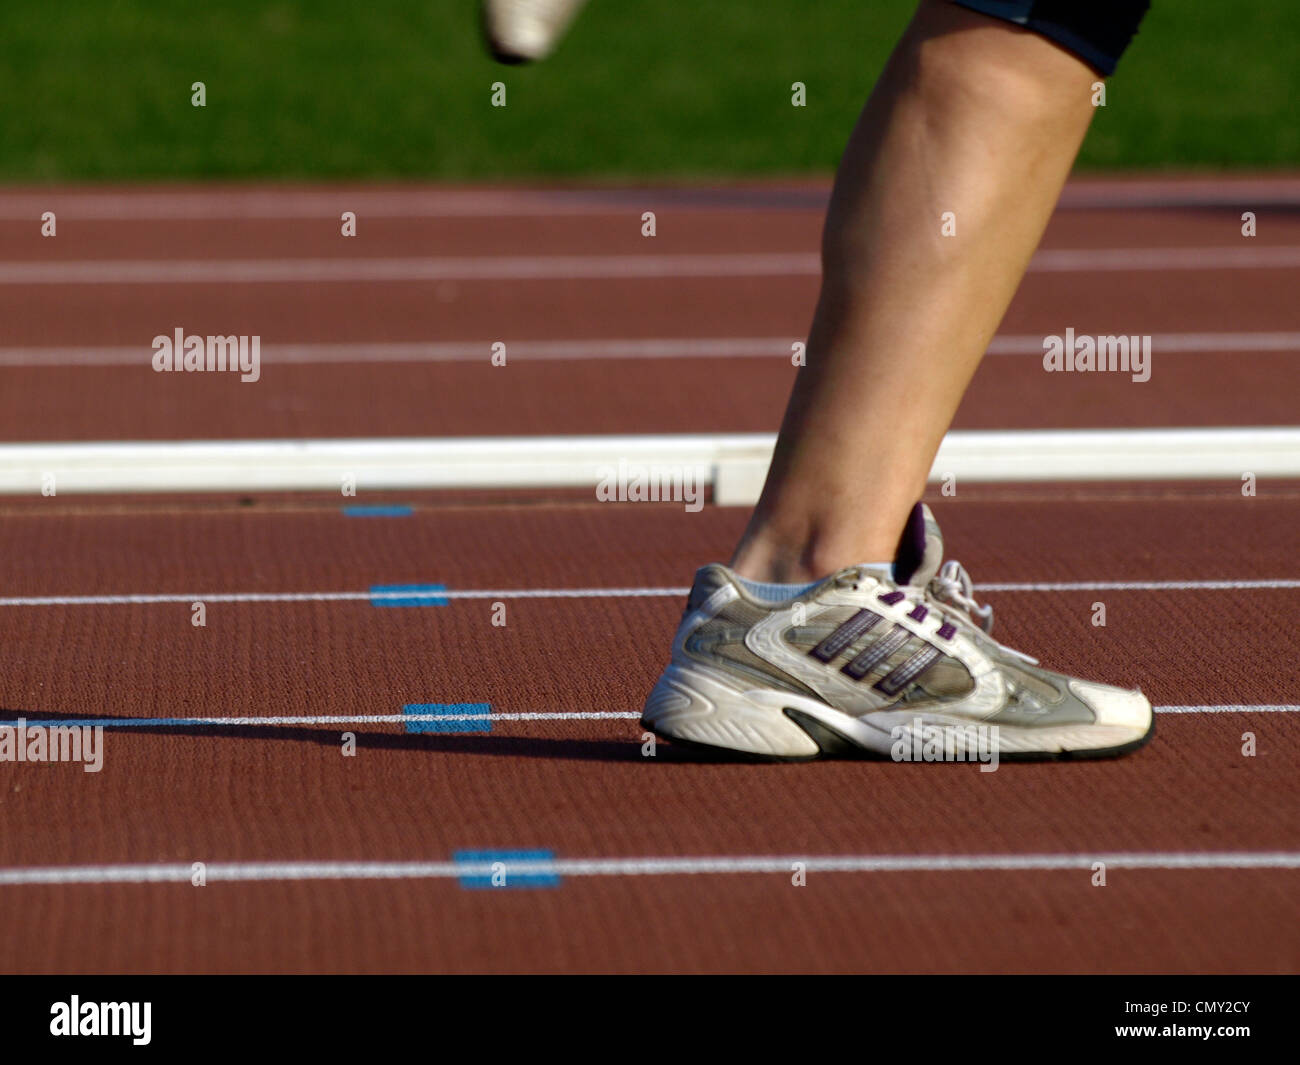 on the athletics track - Stock Image